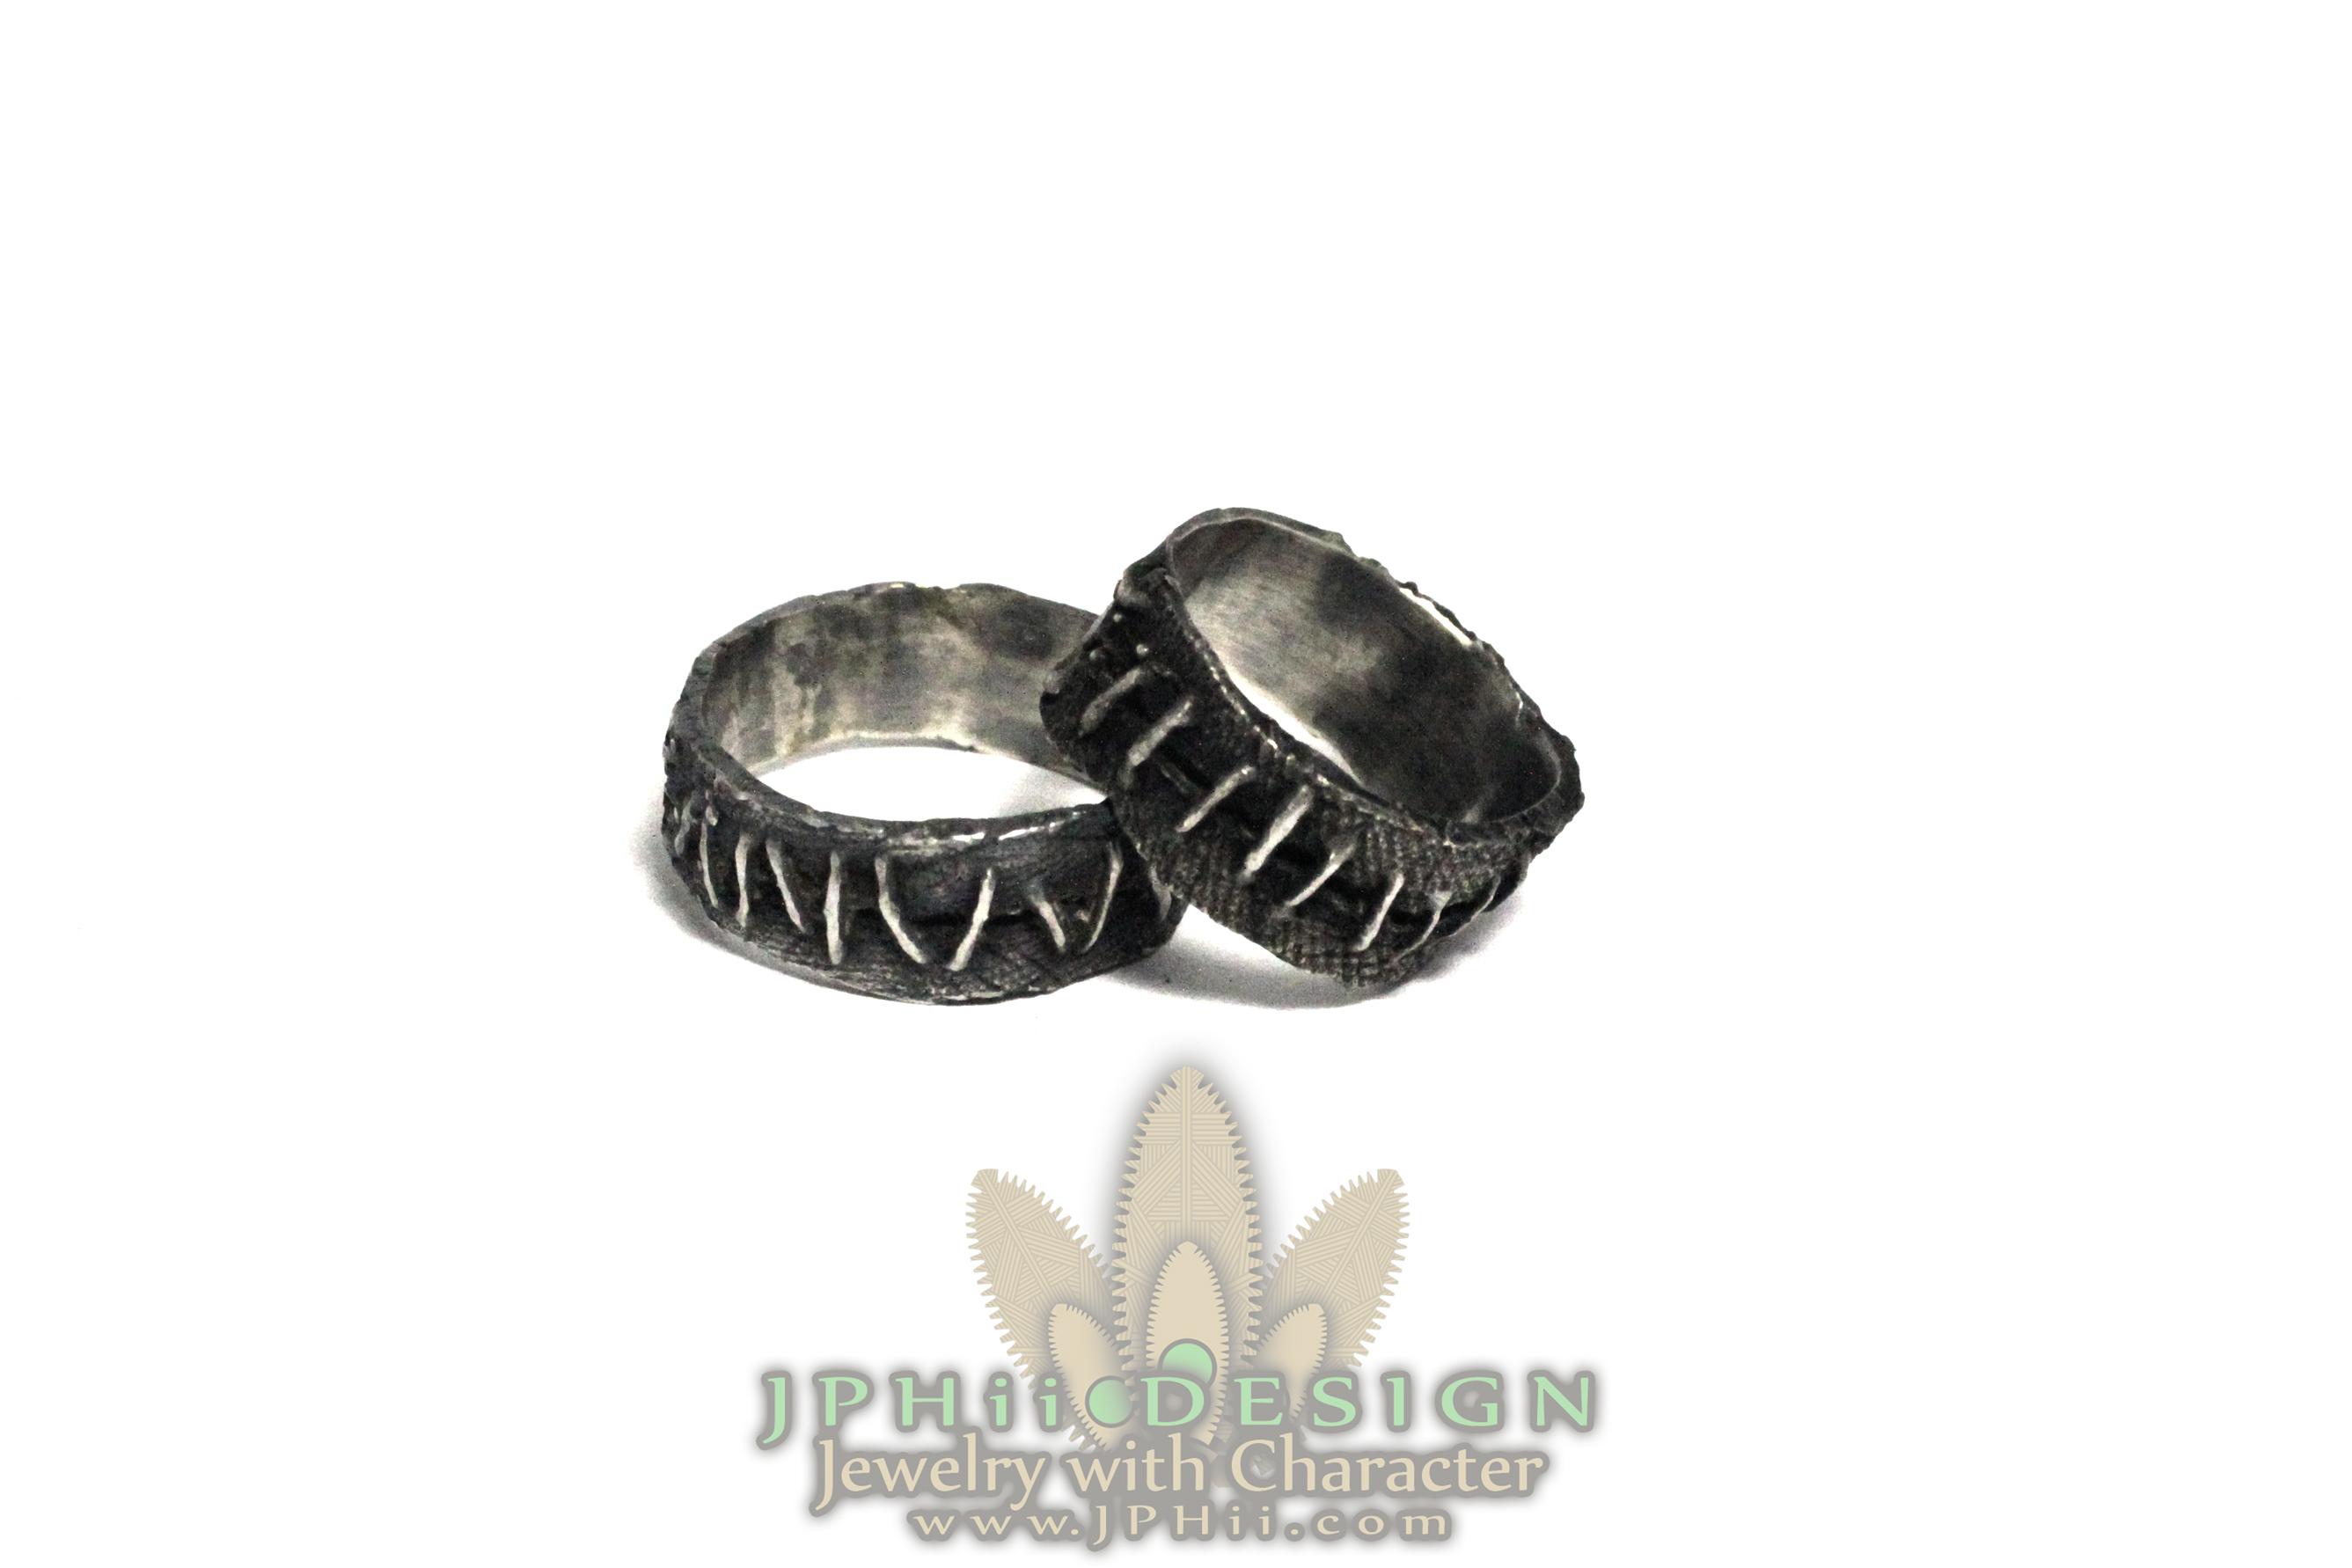 95X Flesh Rings